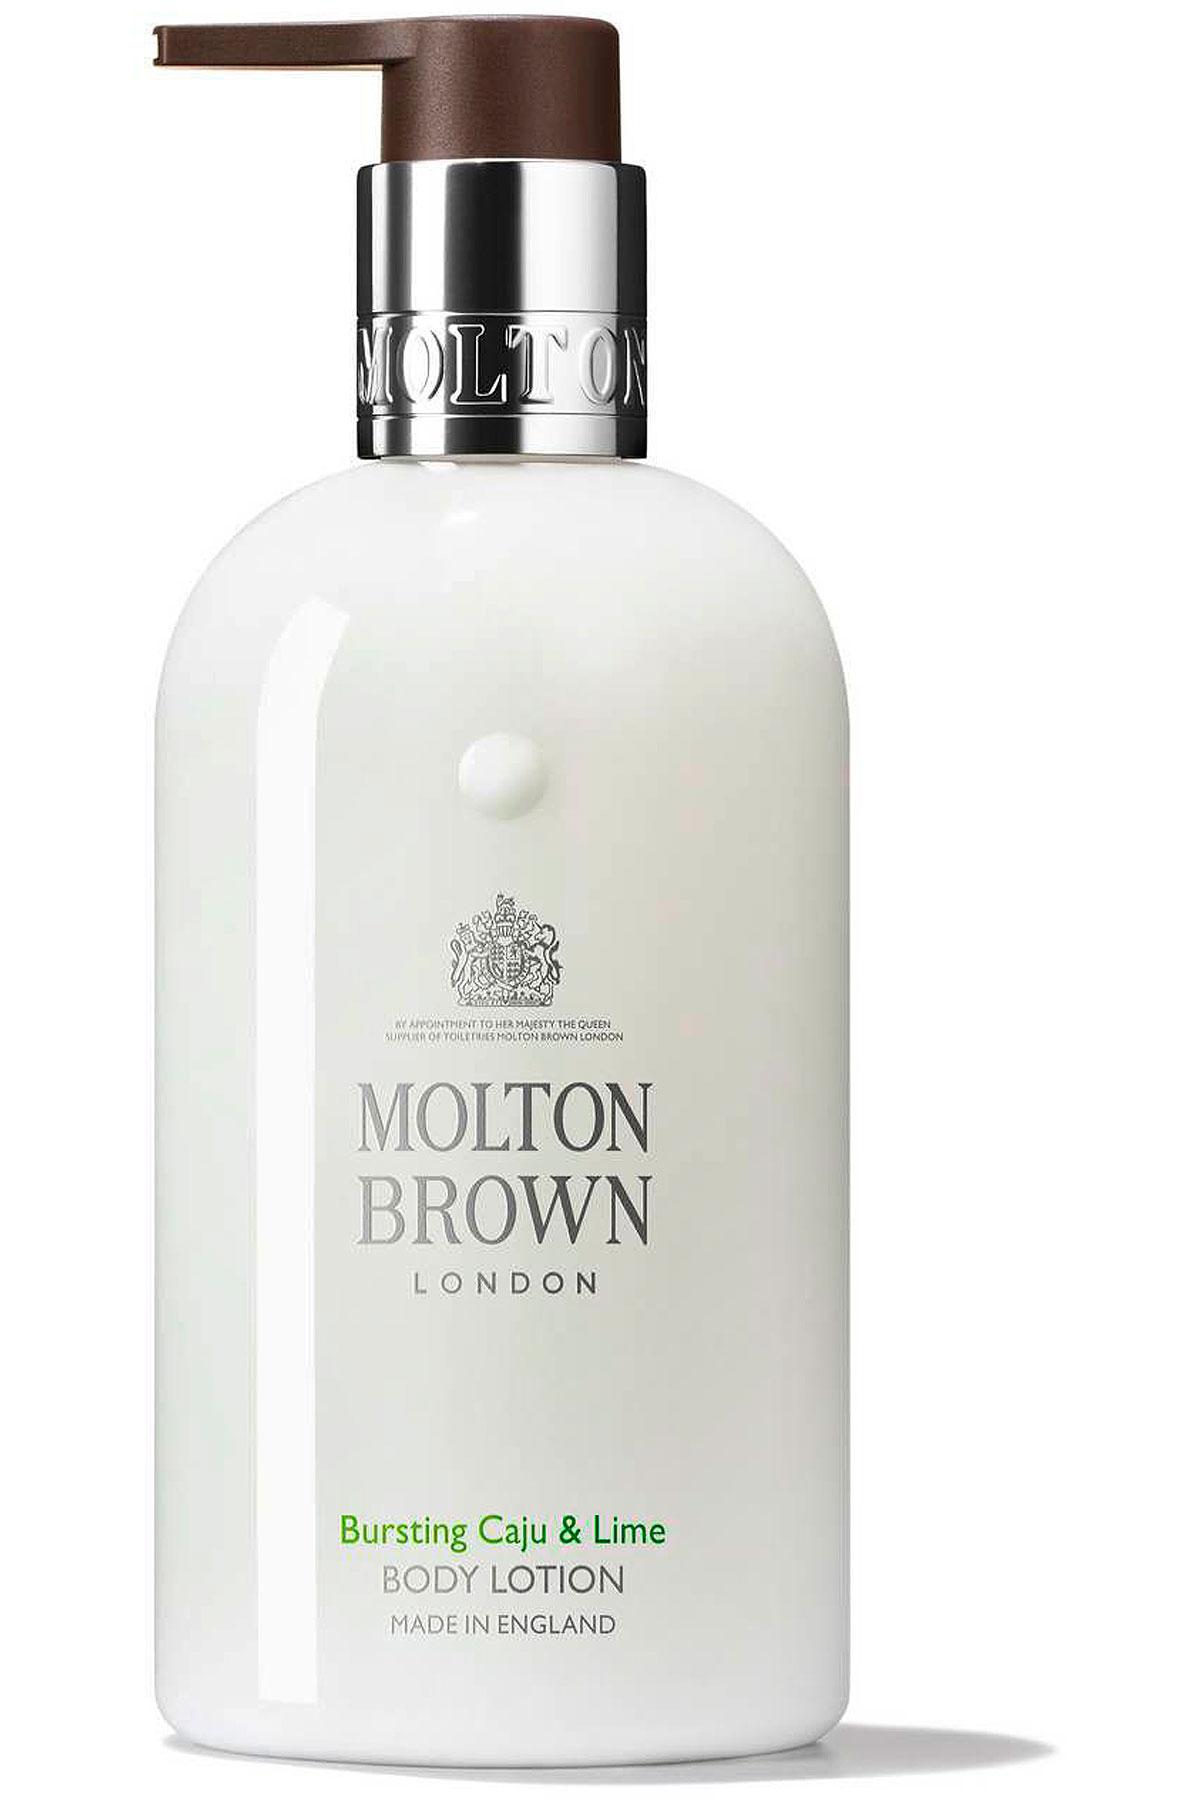 Molton Brown Beauty for Women, Bursting Caju & Lime - Body Lotion - 300 Ml, 2019, 300 ml